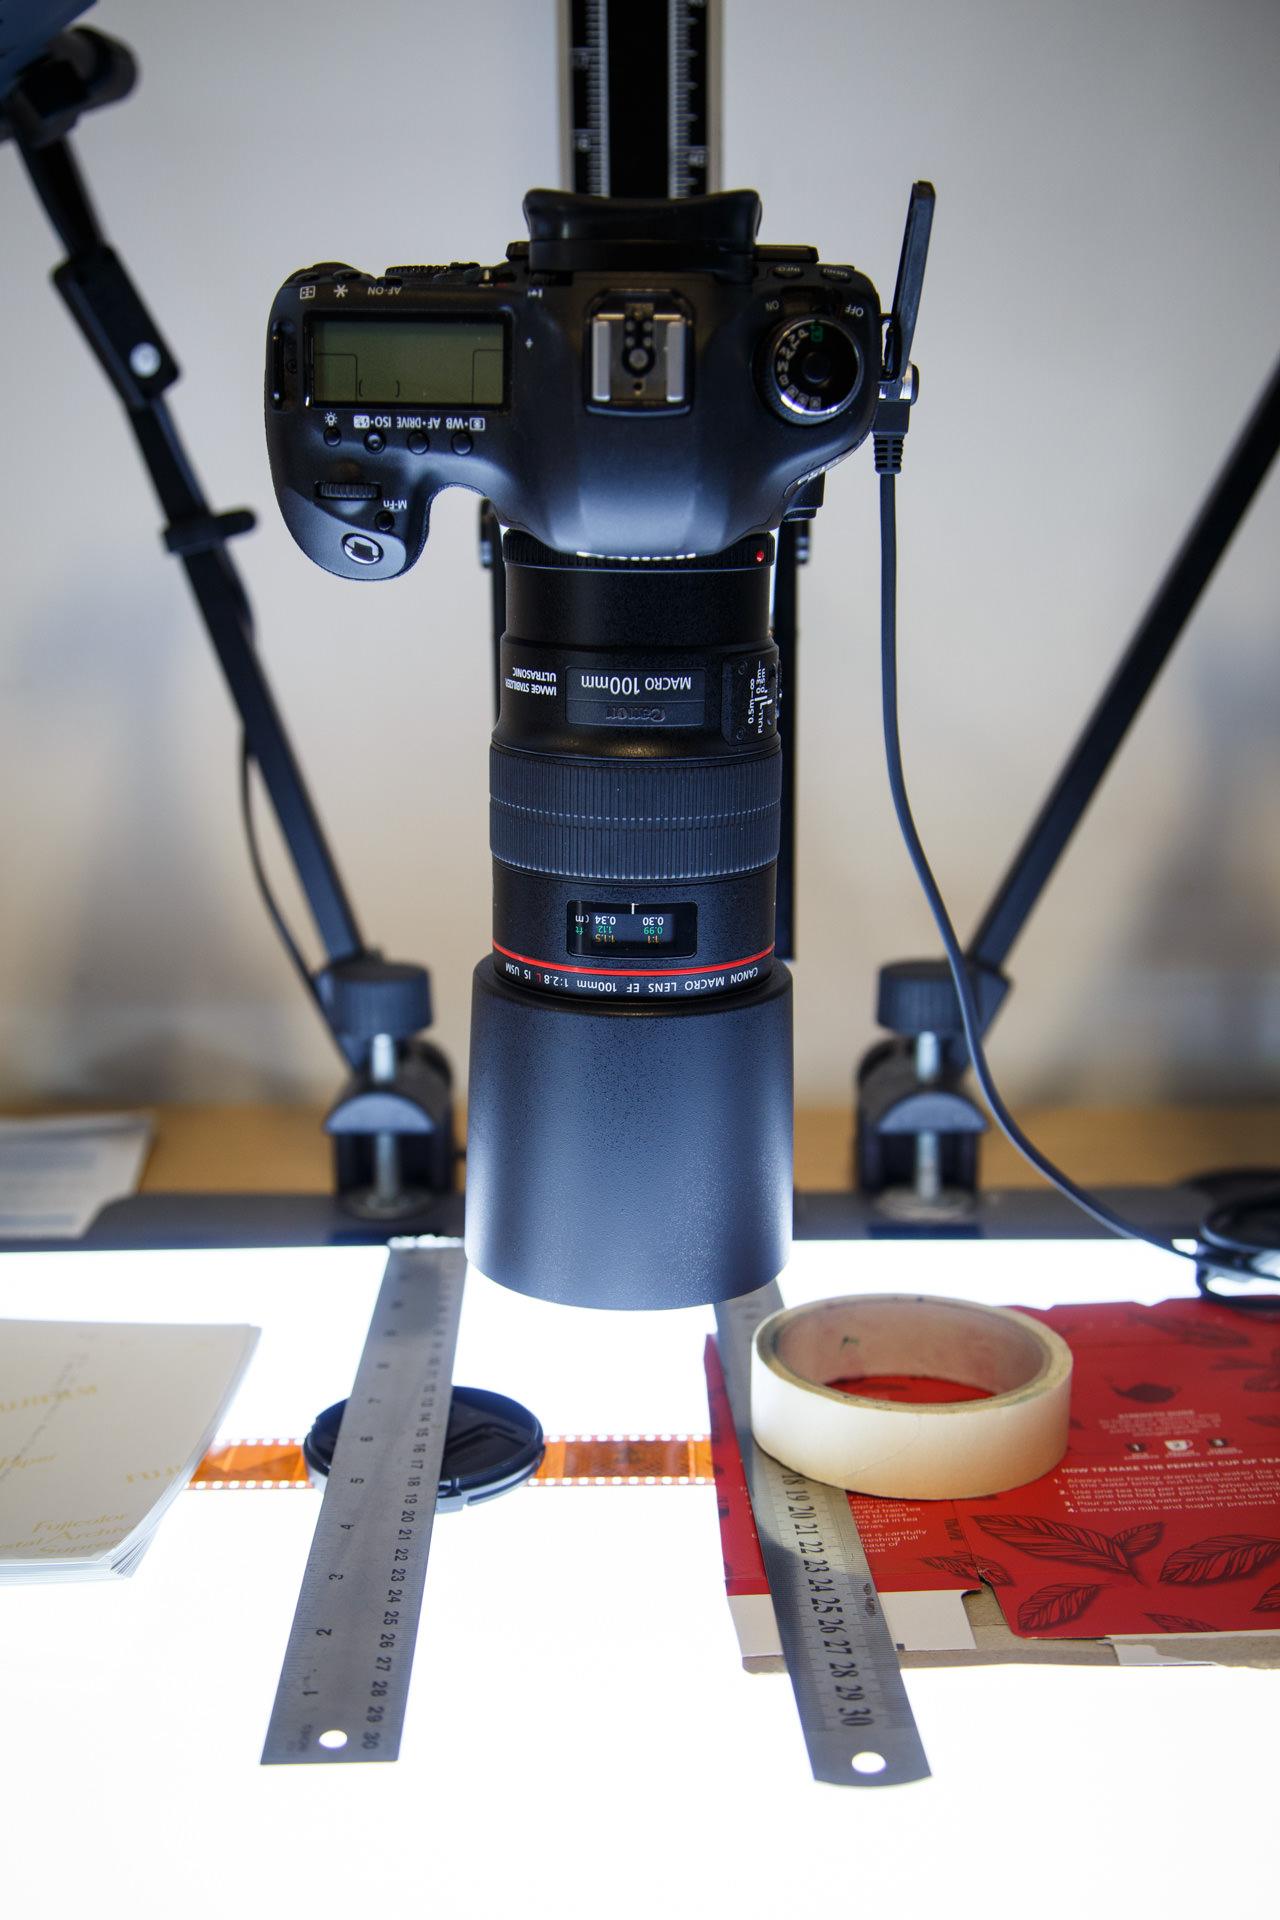 Digitising the film with my camera & macro lens.